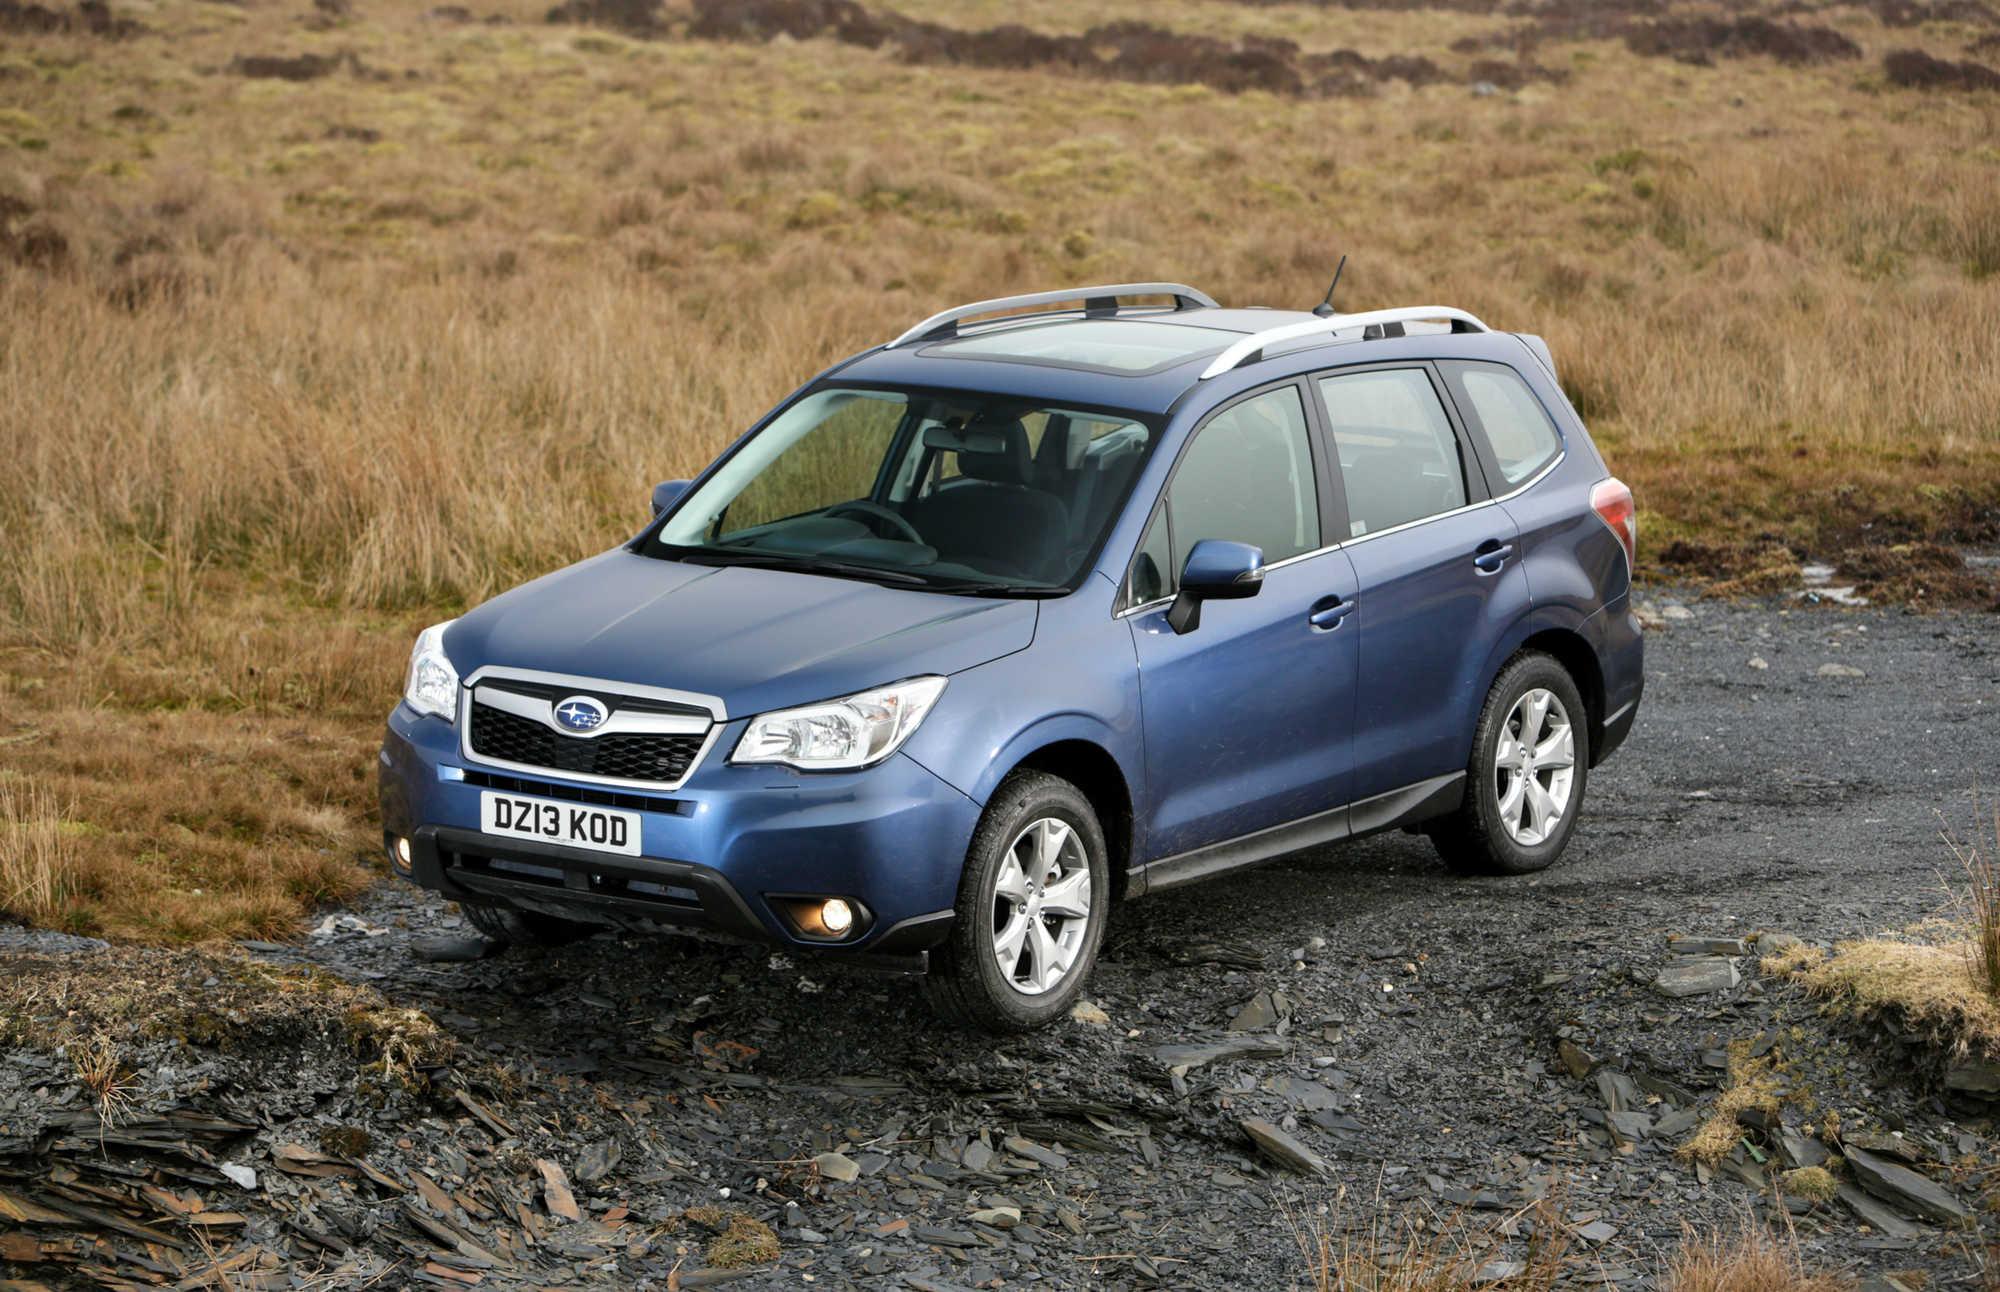 Subaru Forester Suv Review Car Keys